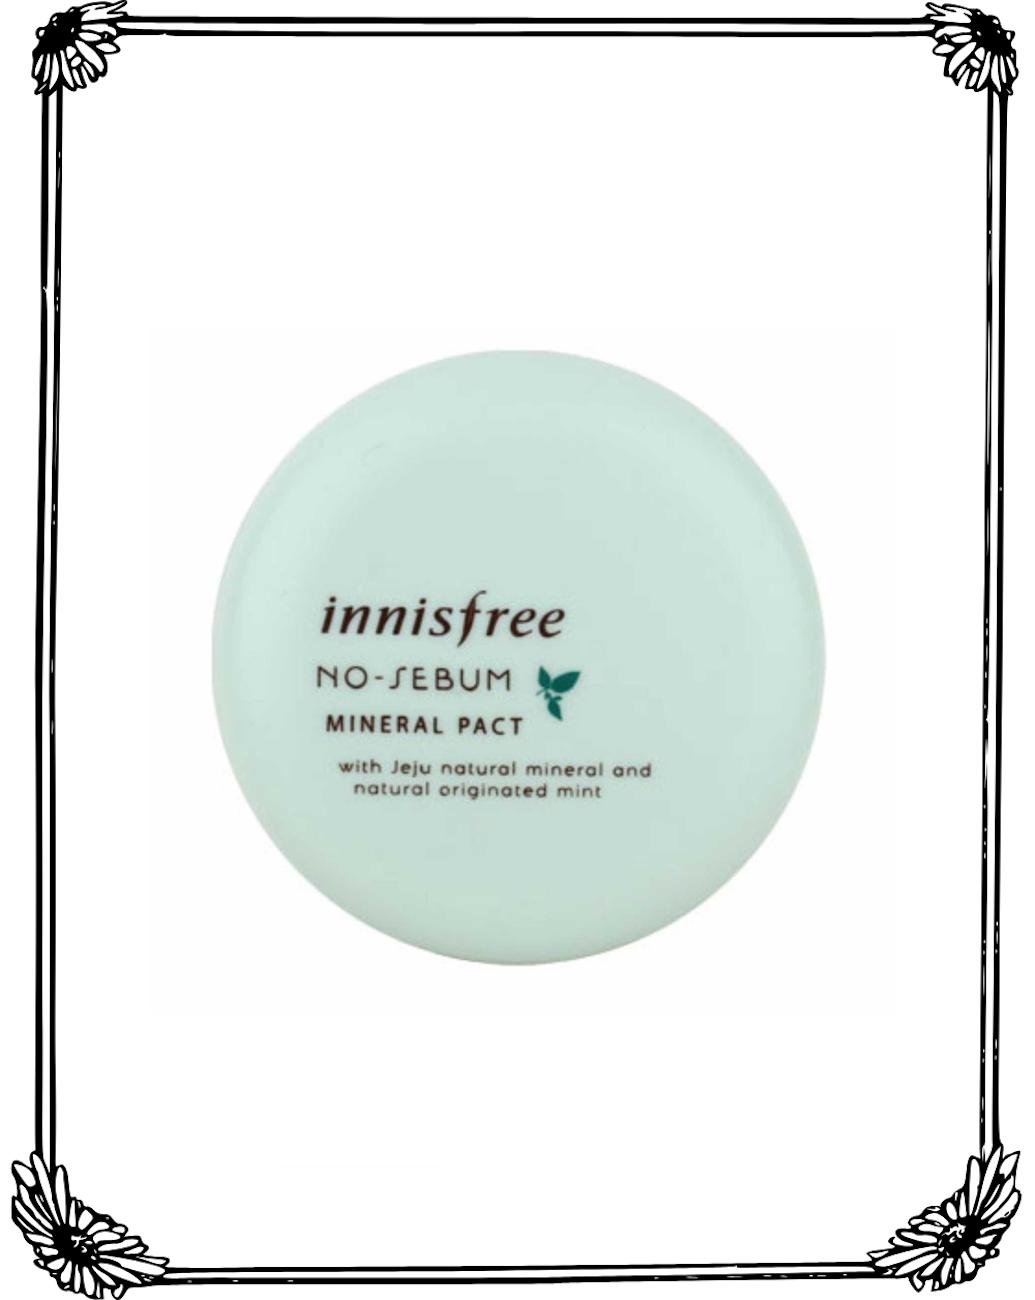 innisfree-no-sebum-compact.png